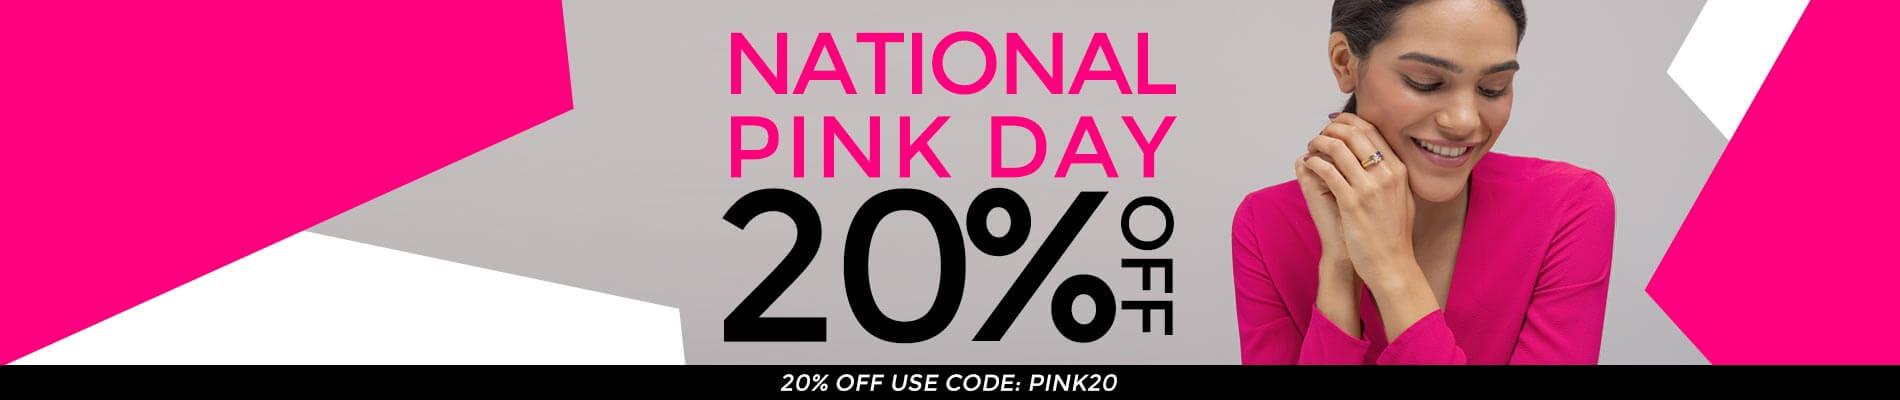 National pink day 23.06 Top banner desktop